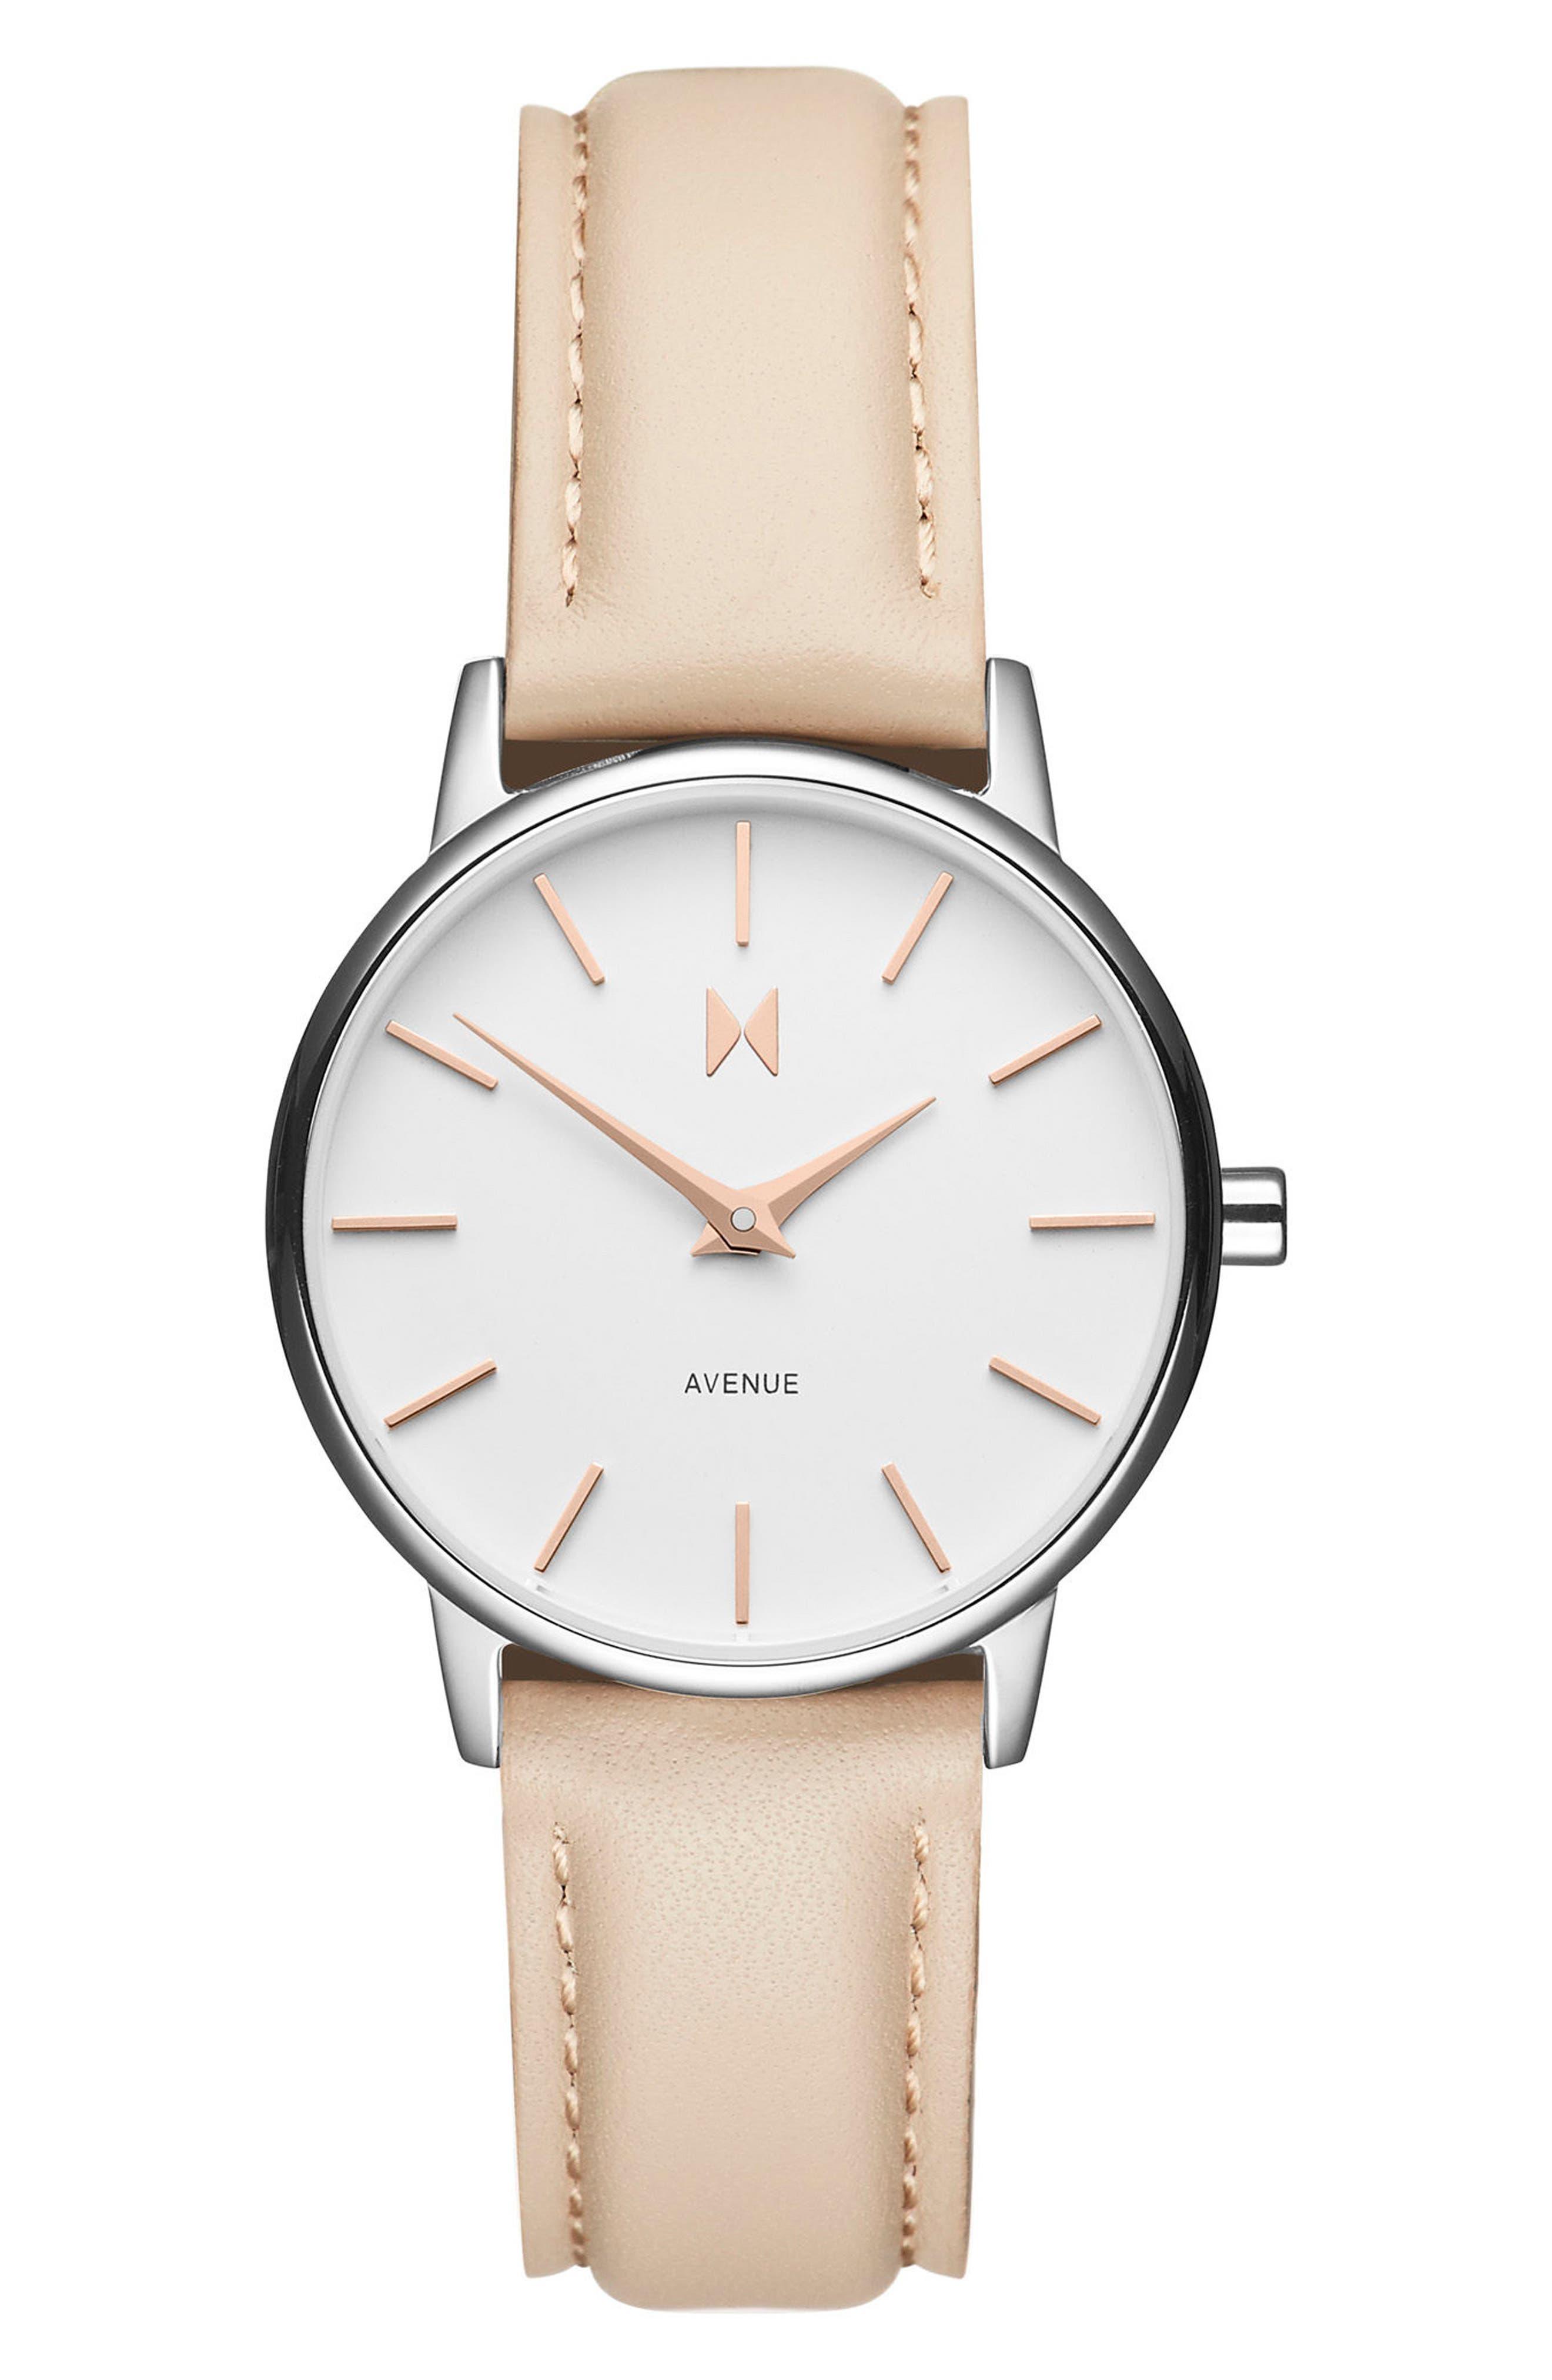 Belamar Leather Strap Watch, 28mm,                             Main thumbnail 1, color,                             Creme/ White/ Silver